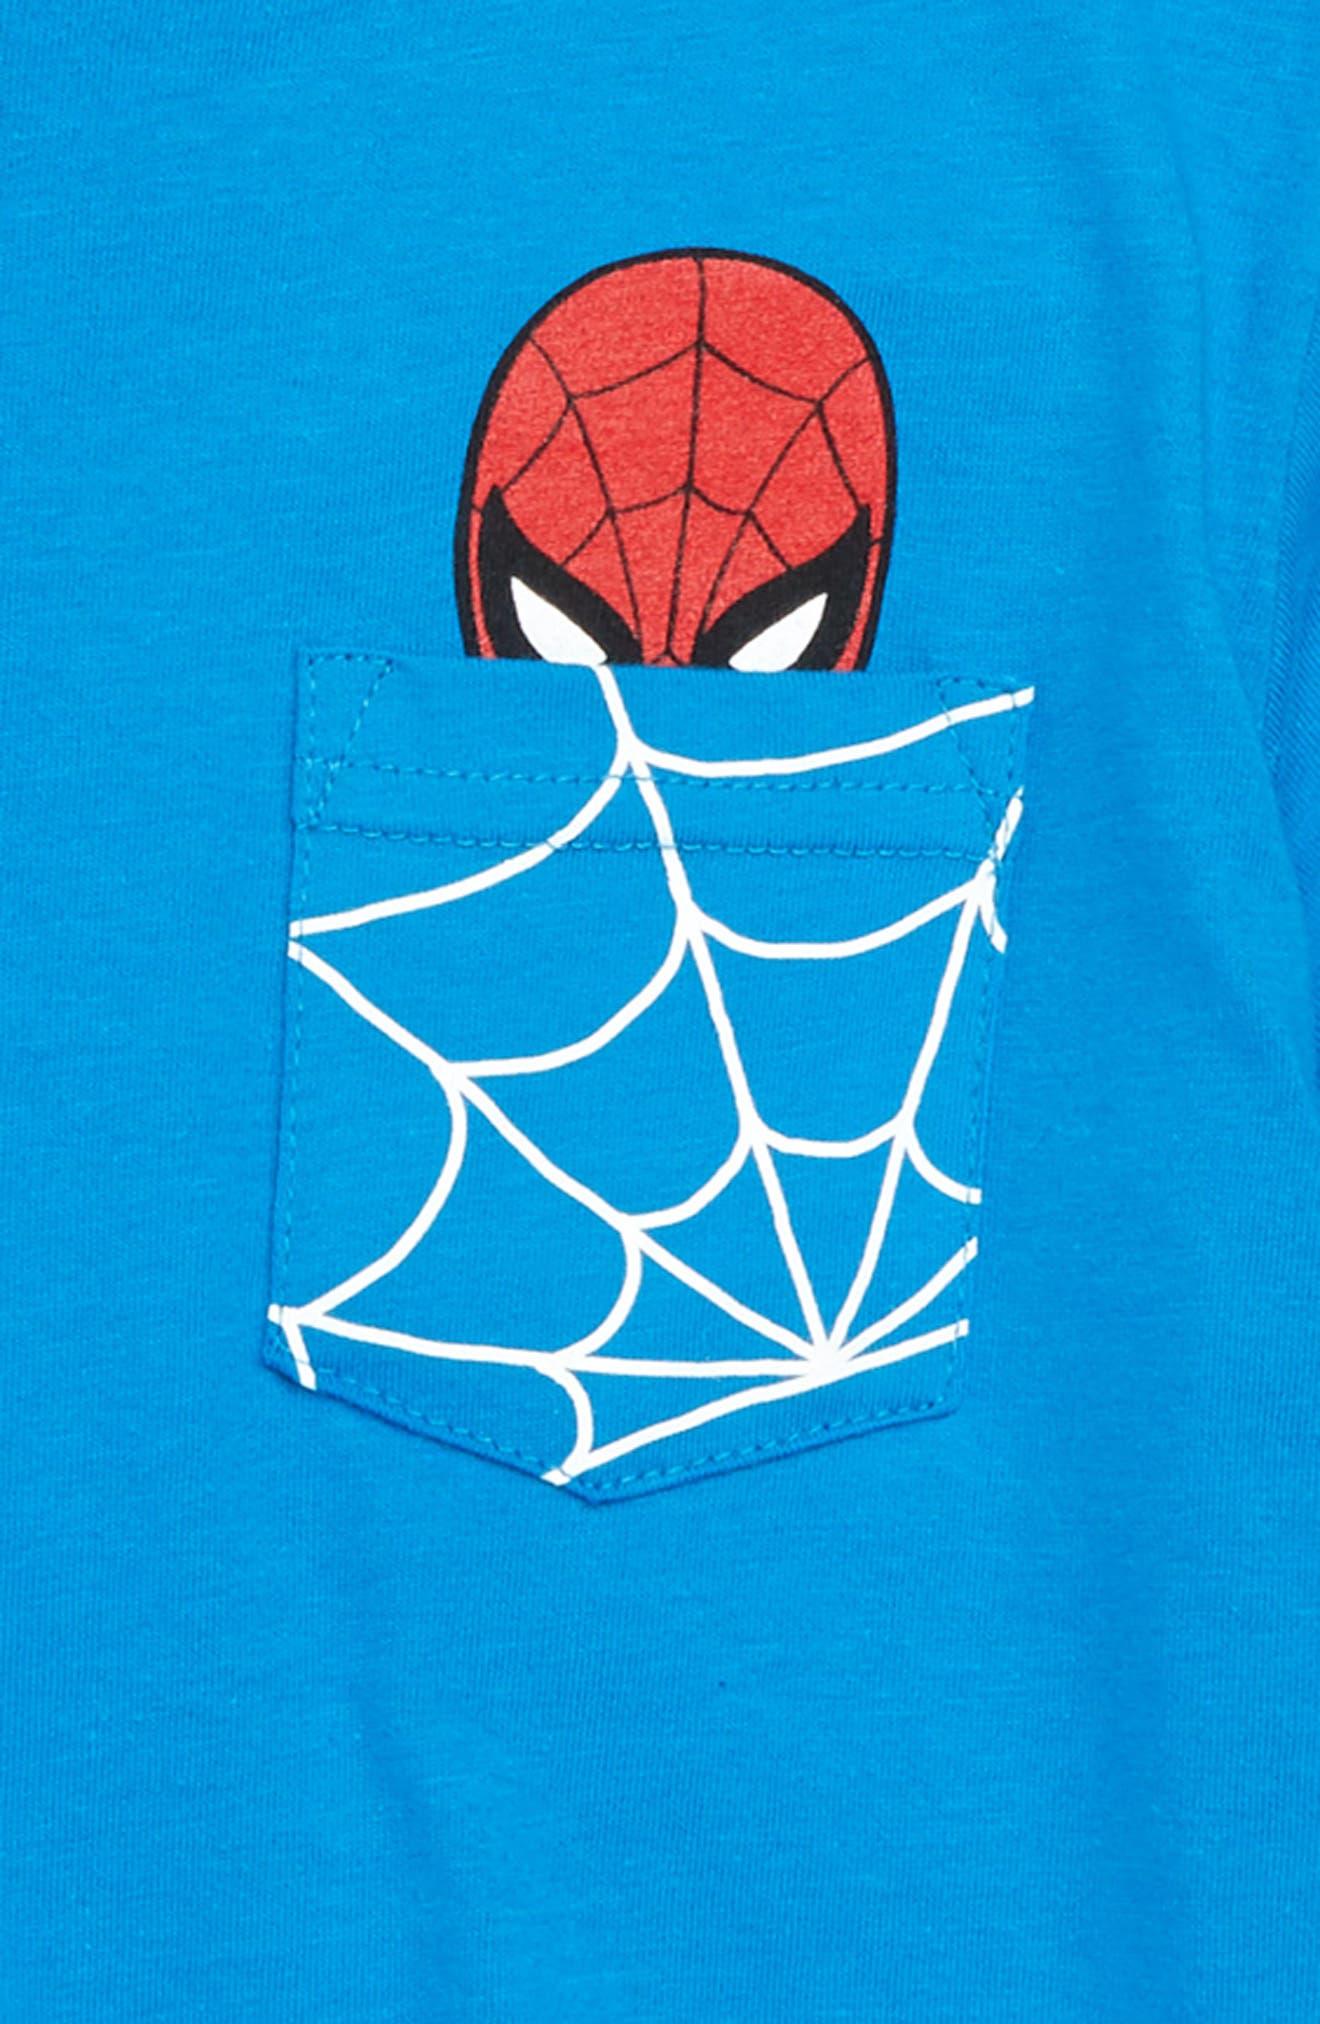 VANS,                             x Marvel<sup>®</sup> Avengers Spider-Man<sup>™</sup> Pocket T-Shirt,                             Alternate thumbnail 3, color,                             420